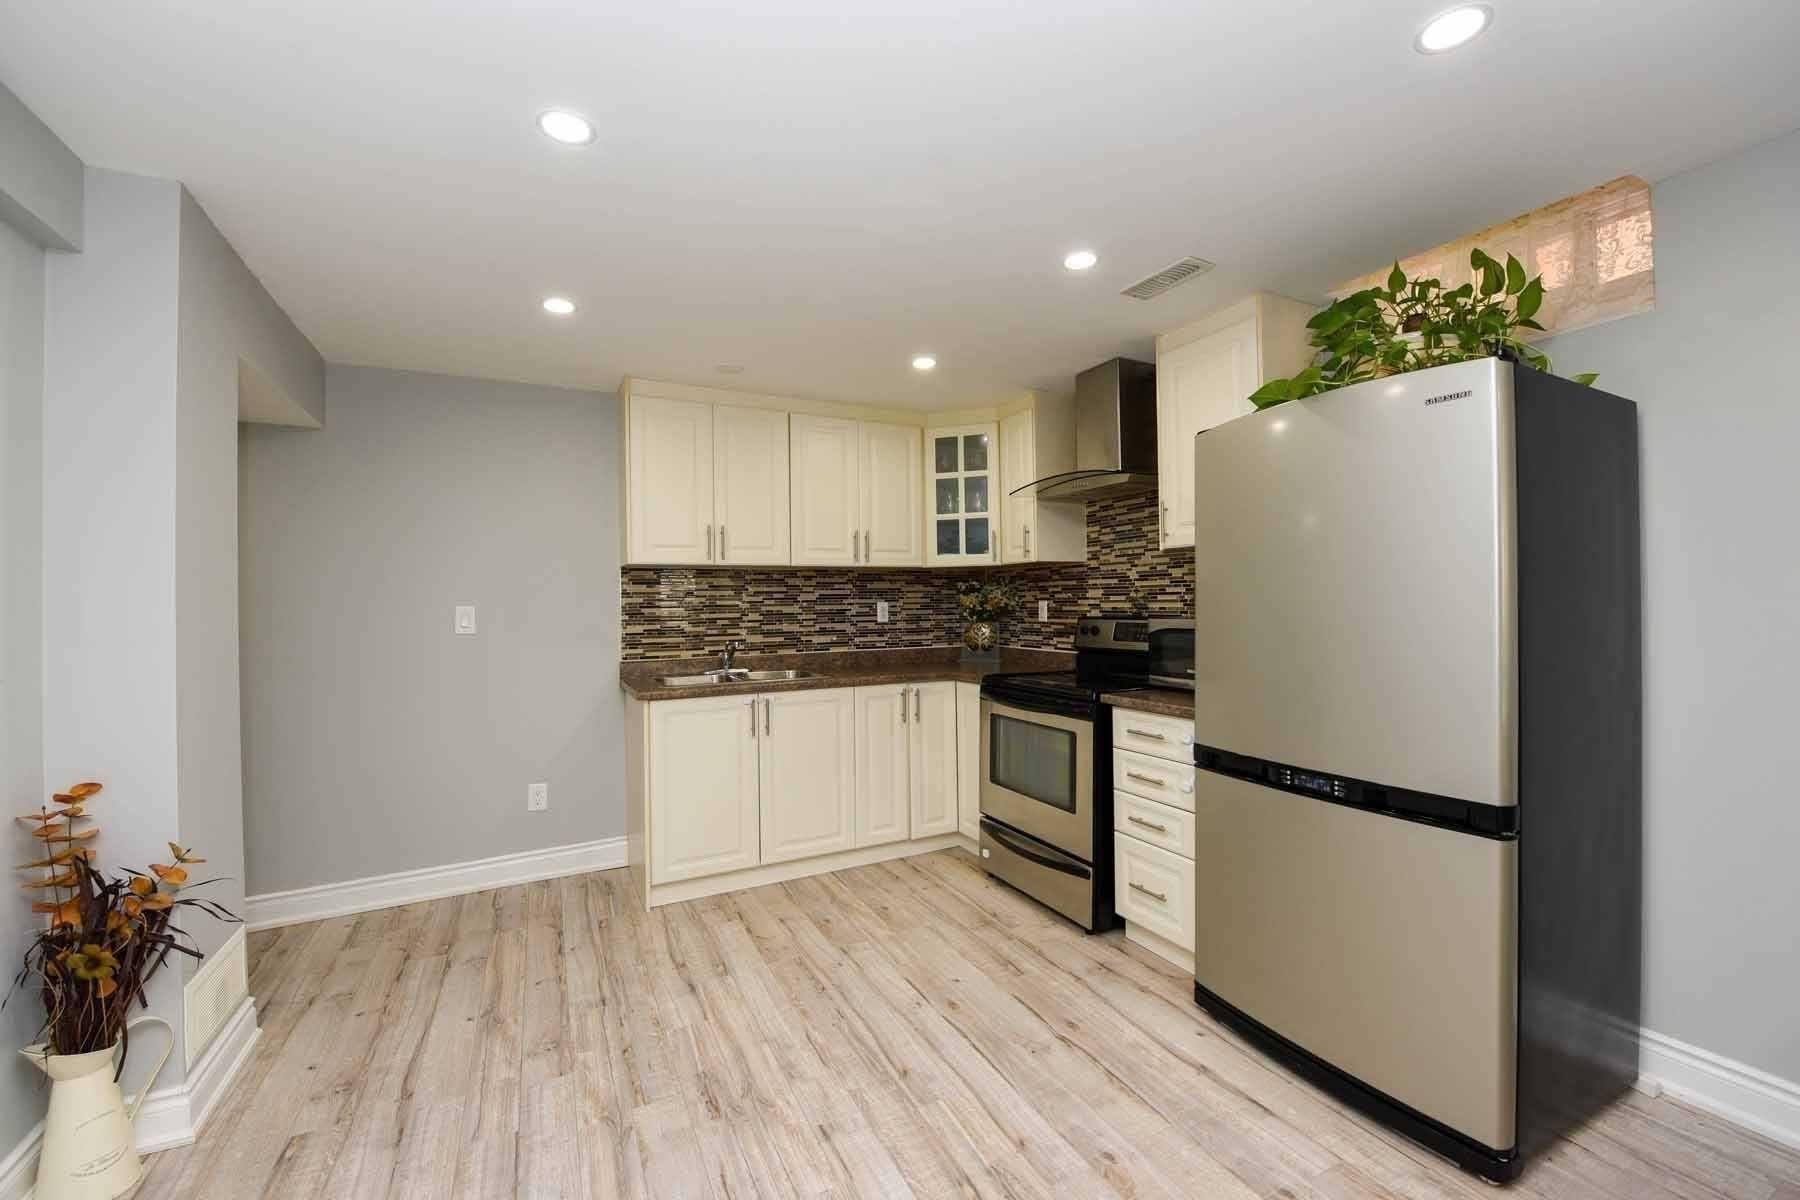 Photo 3: Photos: 20 Hallen Road in Brampton: Fletcher's West House (Apartment) for lease : MLS®# W5074220